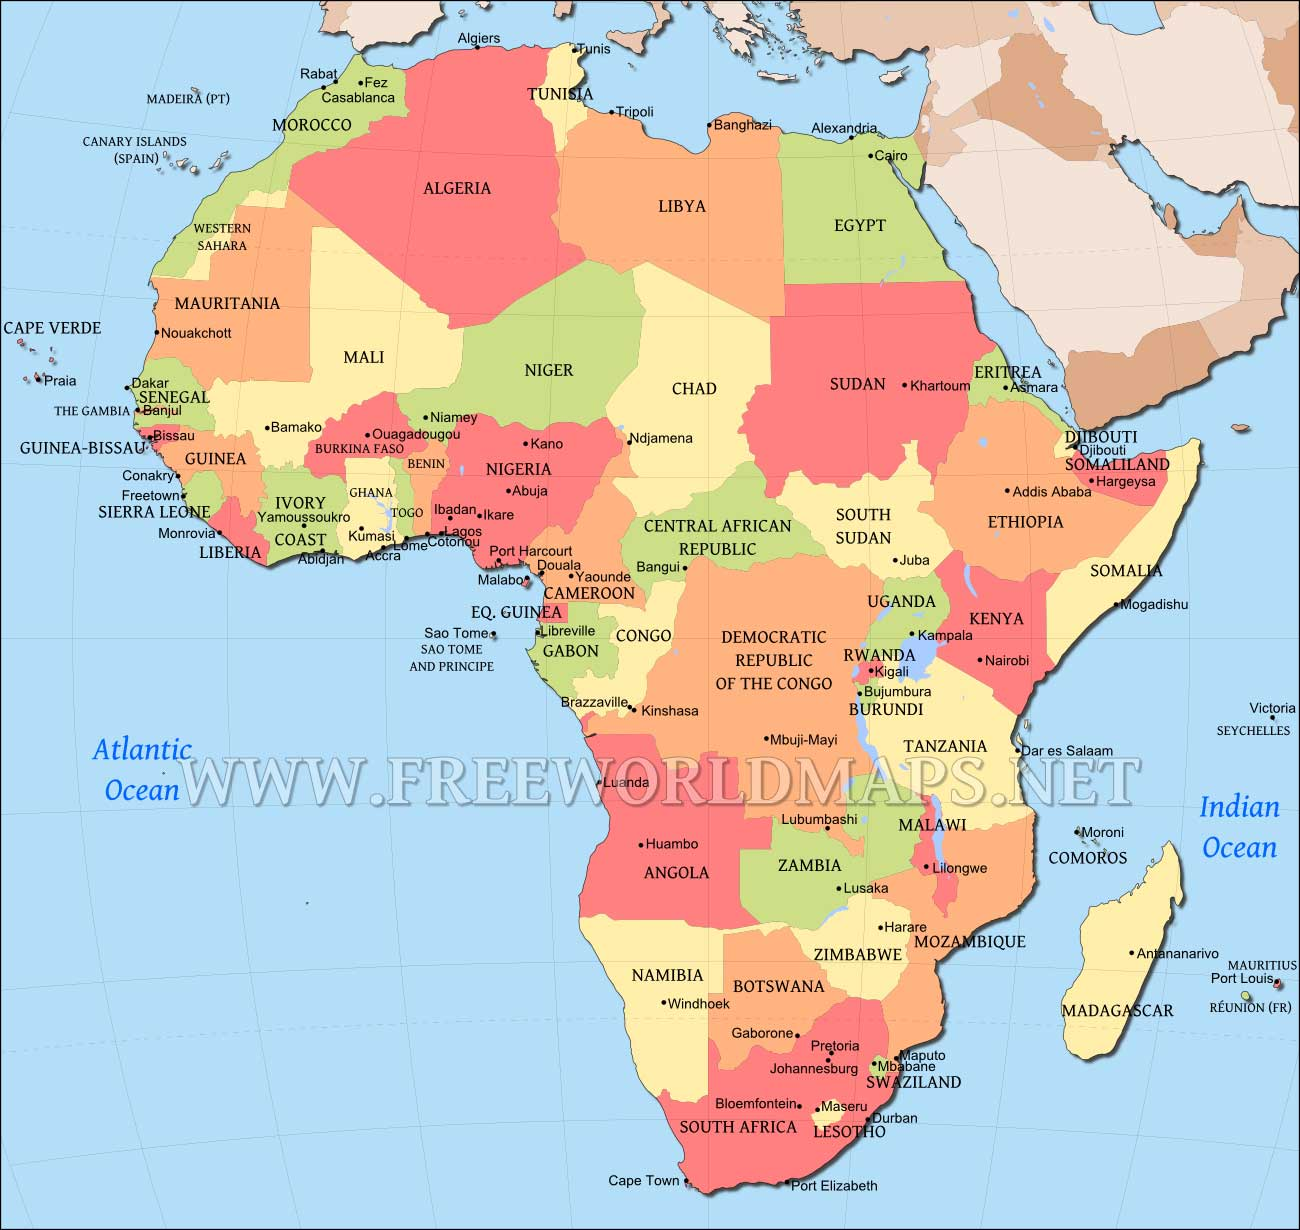 africa map africa map africa map africa map share africa 1300x1230